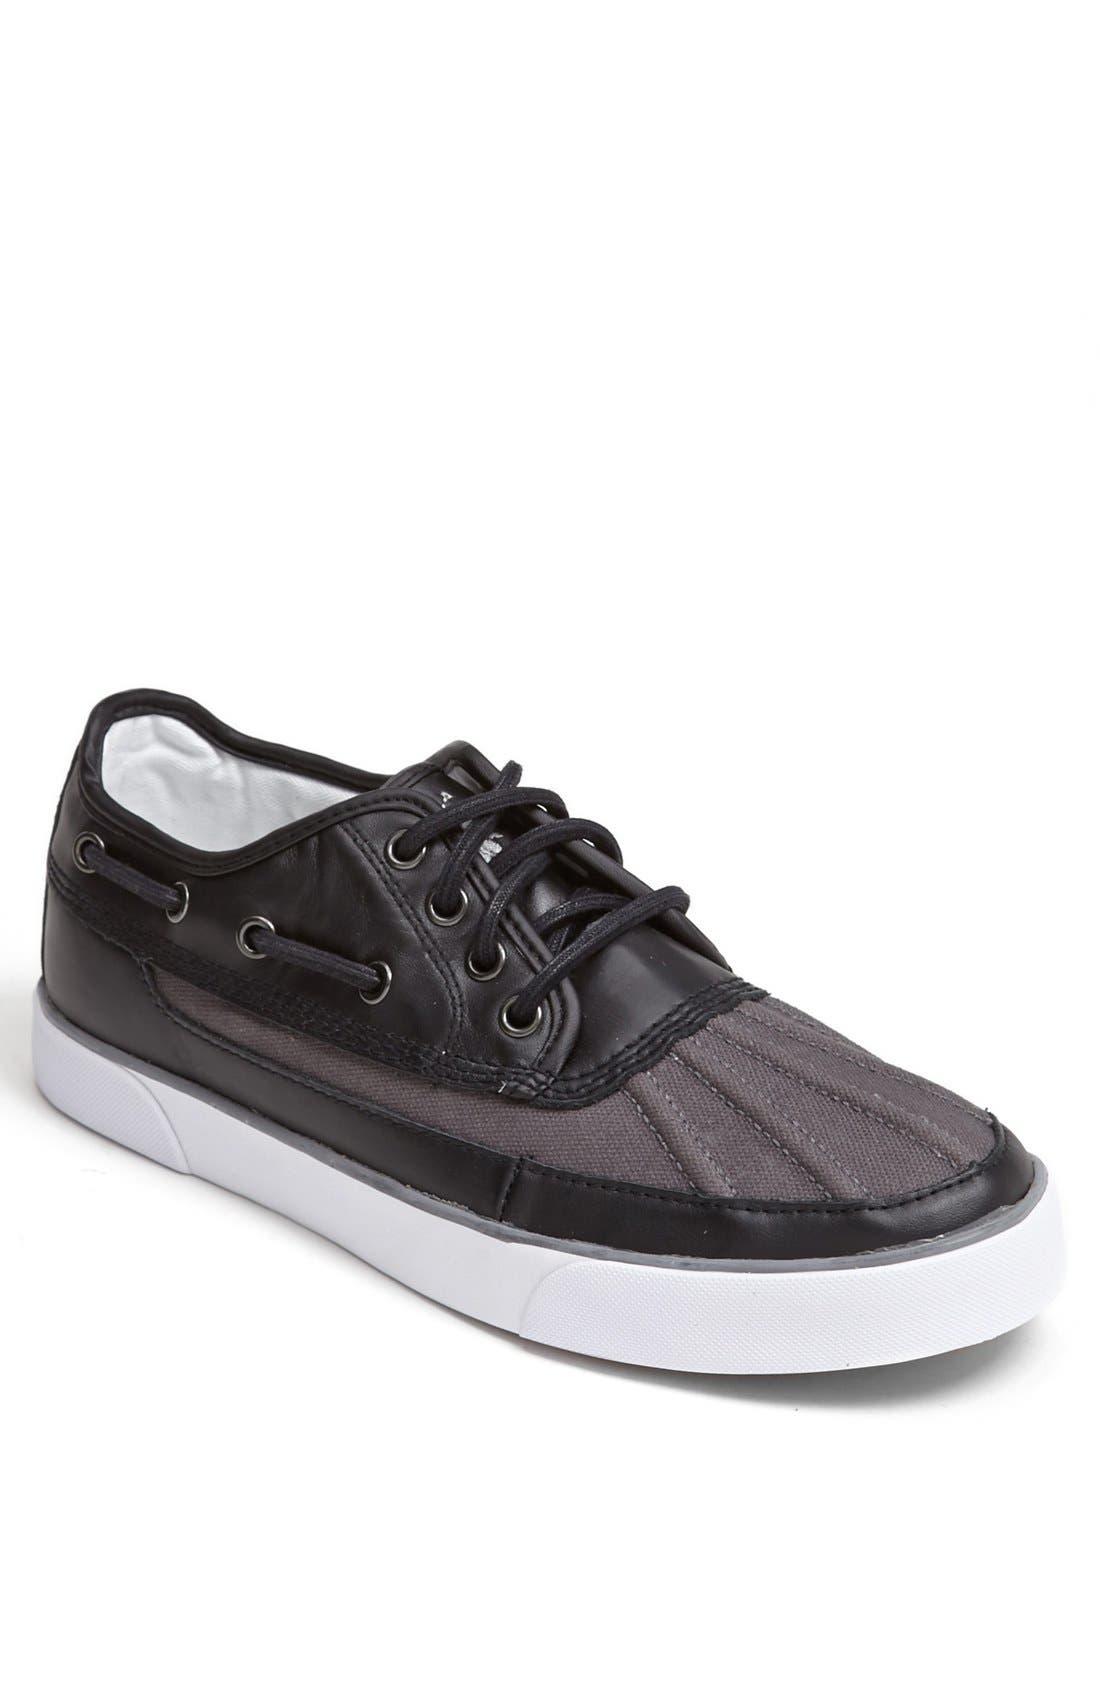 Main Image - Polo Ralph Lauren 'Parkstone' Sneaker